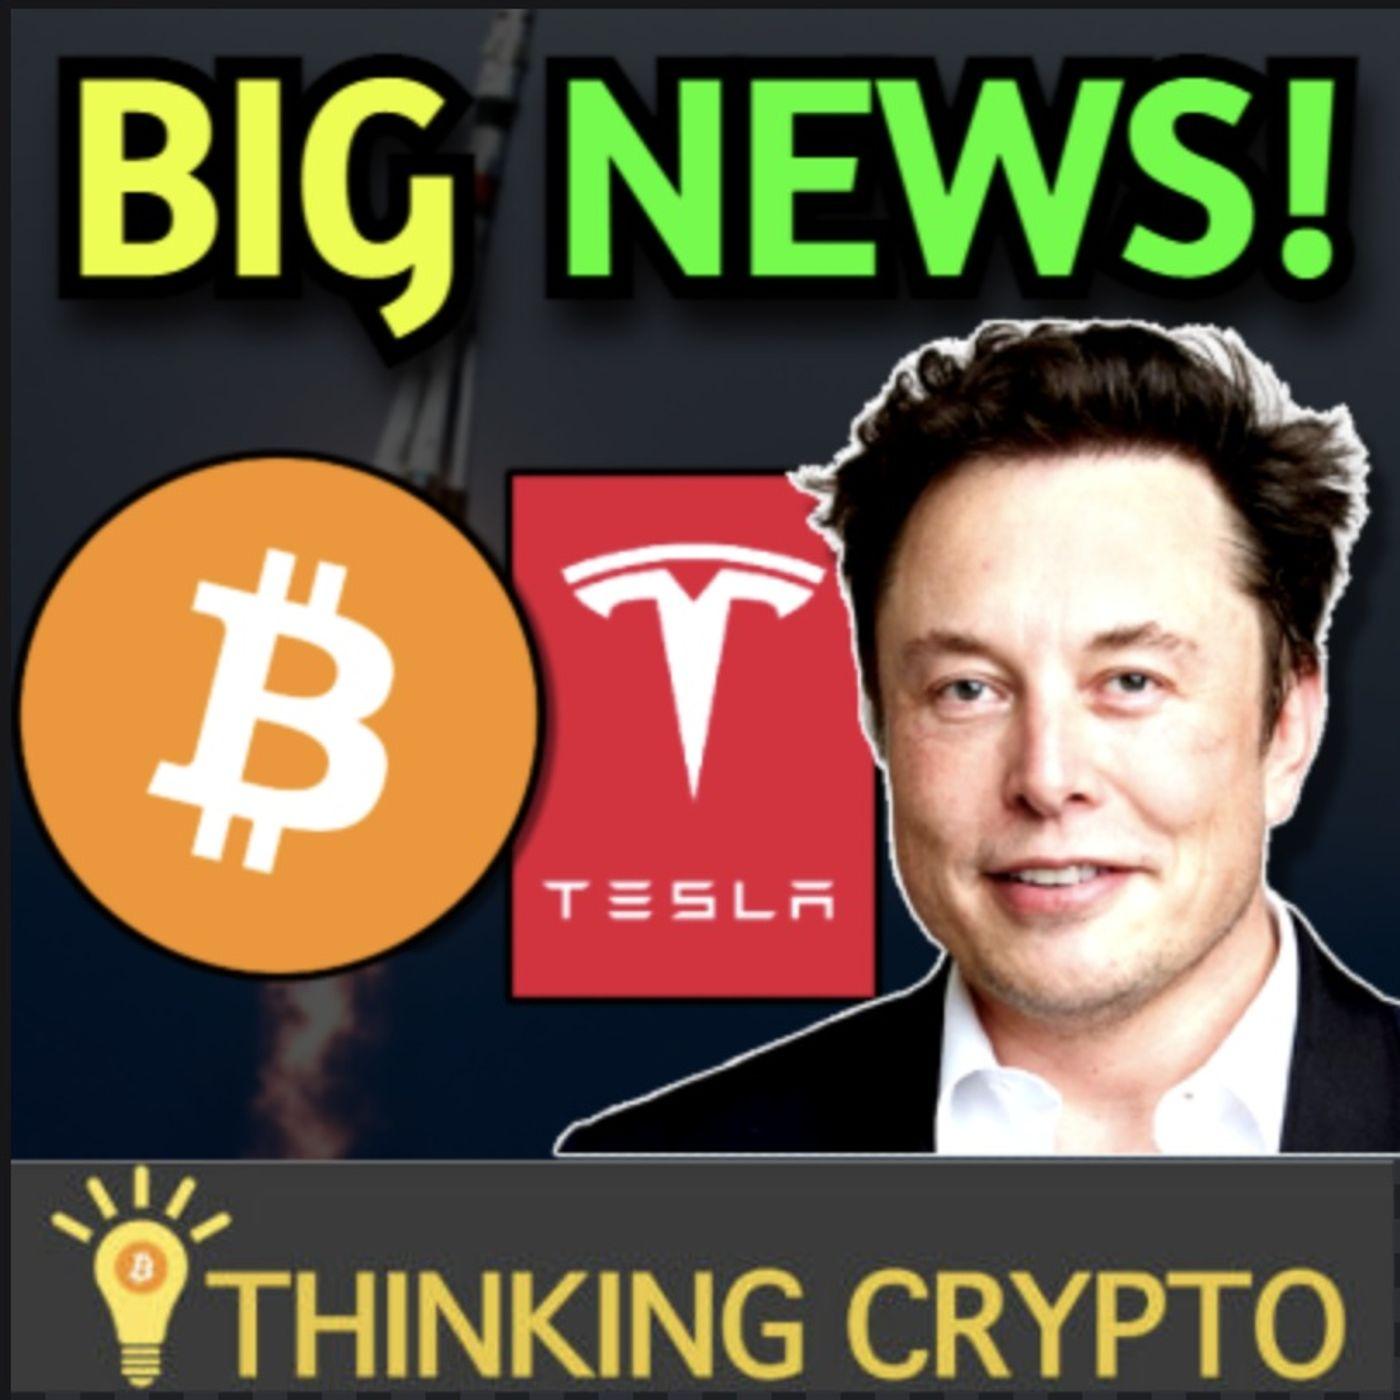 Elon Musk Says Tesla To Accept Bitcoin Payments Again - Central American Bank El Salvador Bitcoin Law